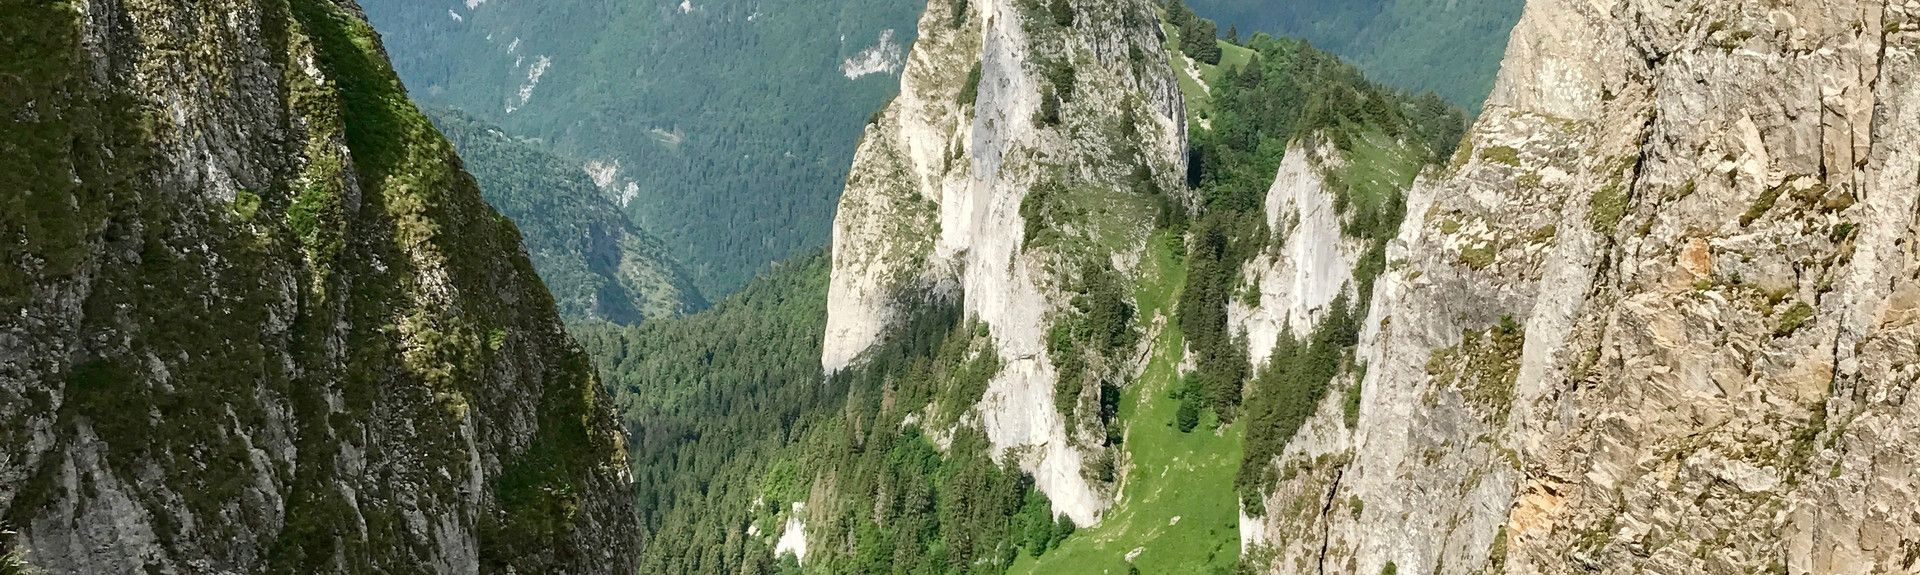 Sciez, Auvergne-Rhône-Alpes, France